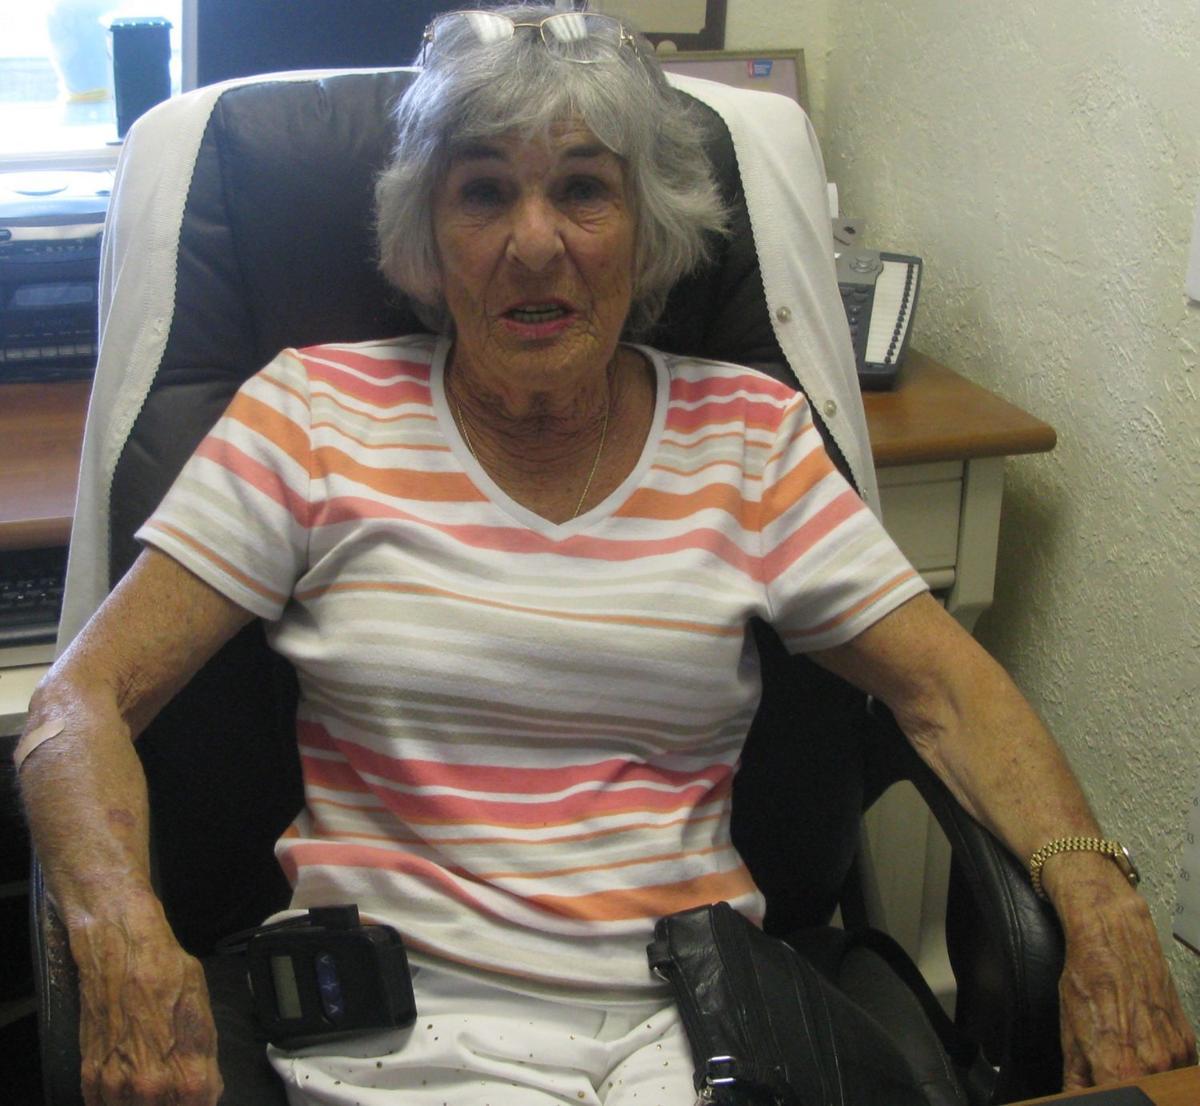 A stroke survivor's story